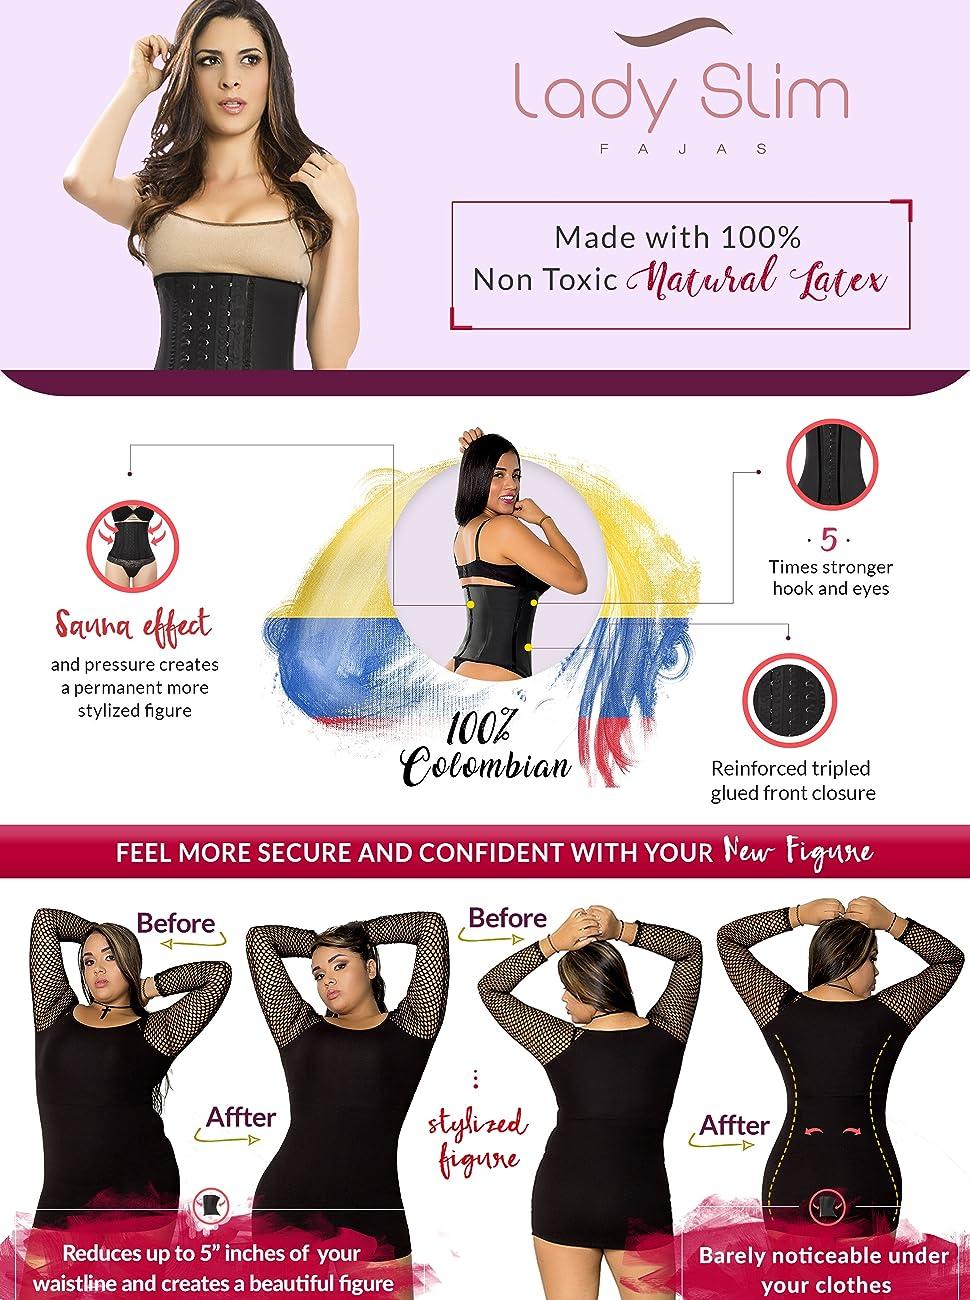 Waist chincher trainer corset faja colombiana latex body shaper work out cinturilla wight loss